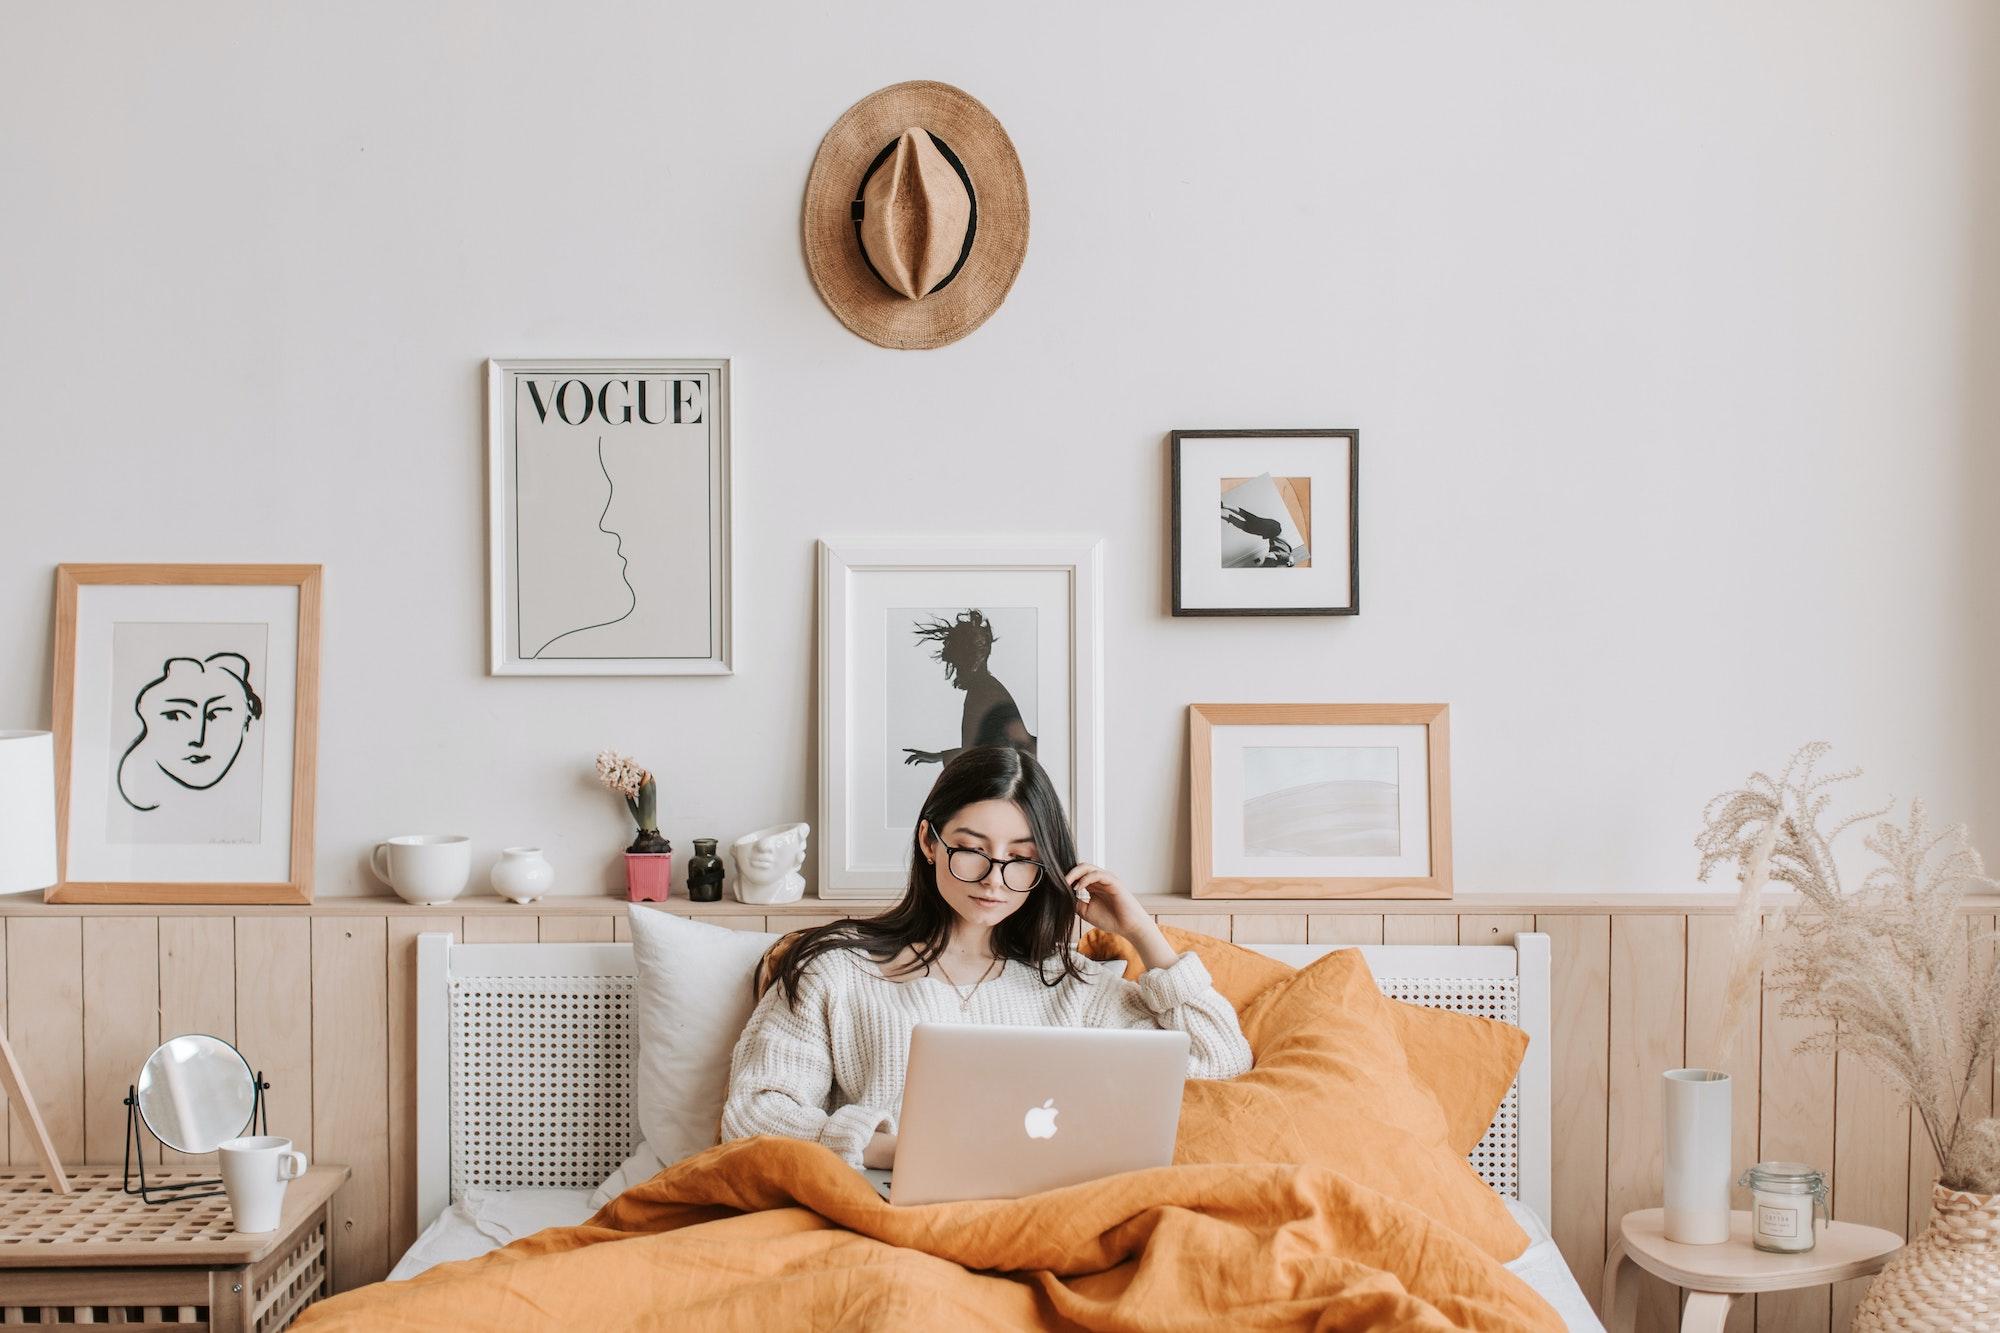 How to make Netflix nights better   Technology   Elle Blonde Luxury Lifestyle Destination Blog